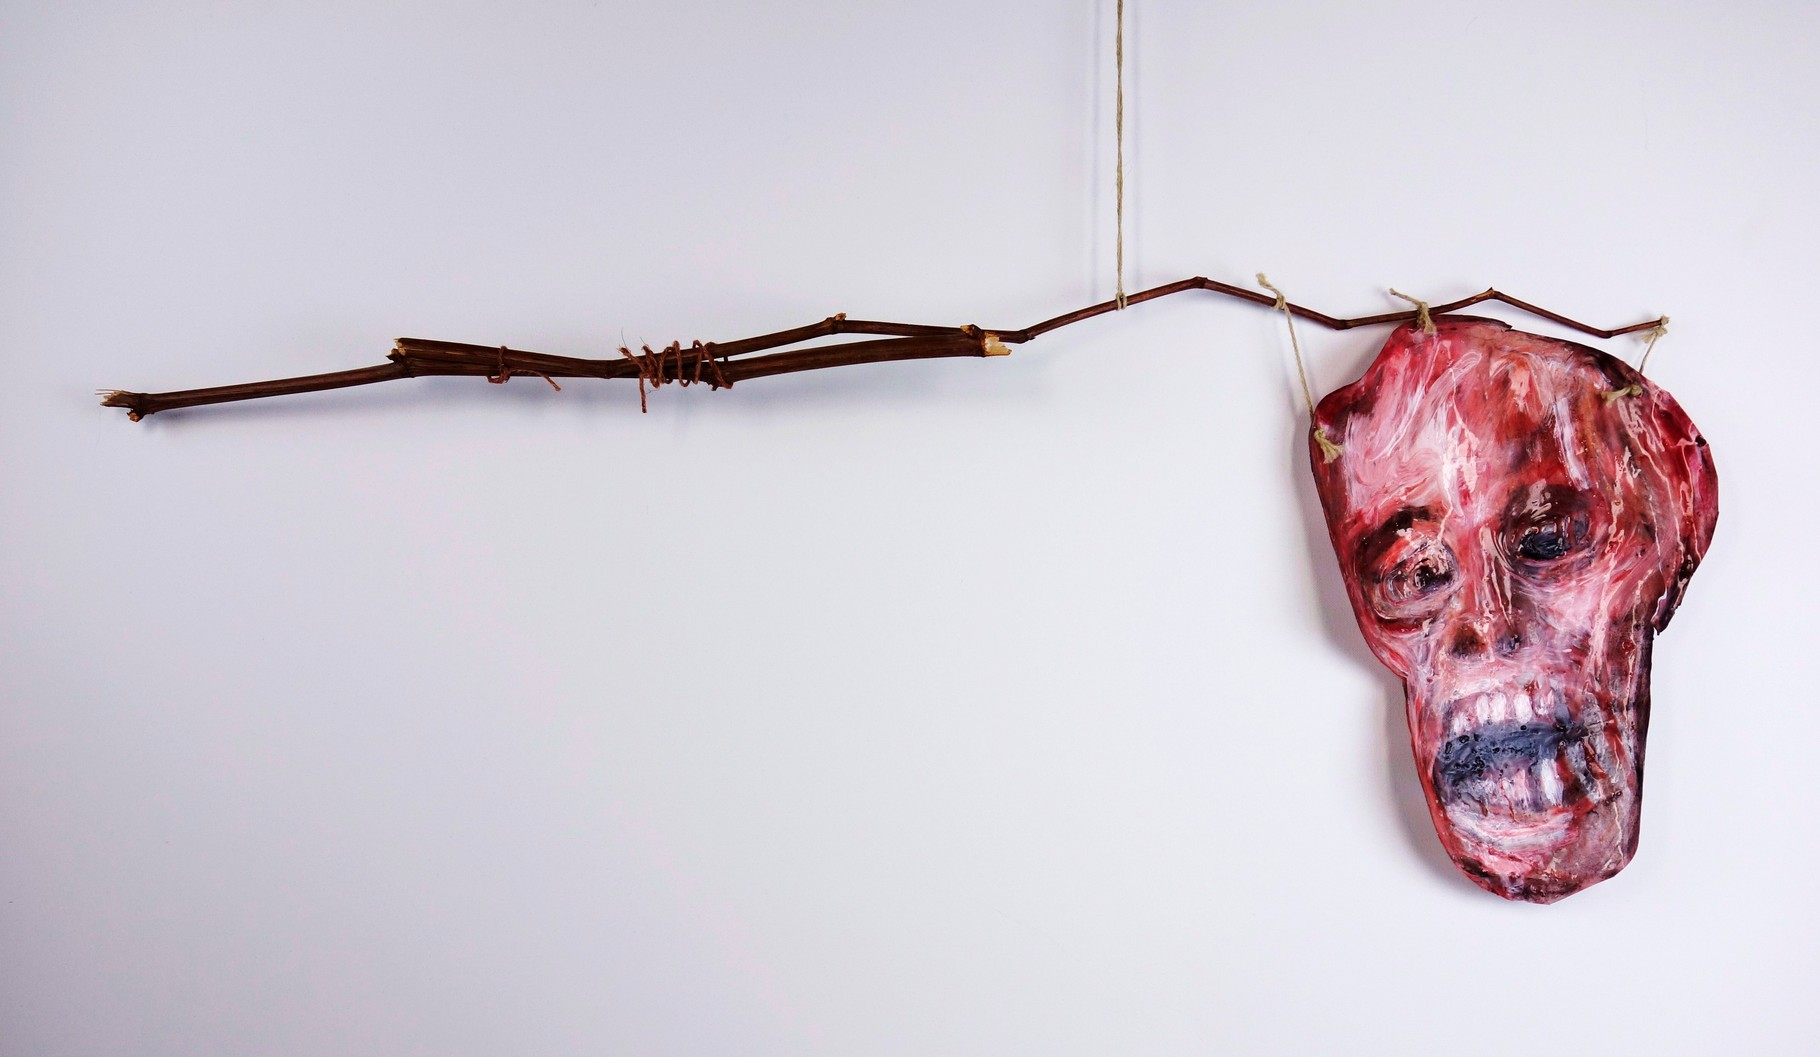 Fragiles Gleichgewicht II, 215, Holz, Silikon, Pigmente, ca. 84 x 50 cm